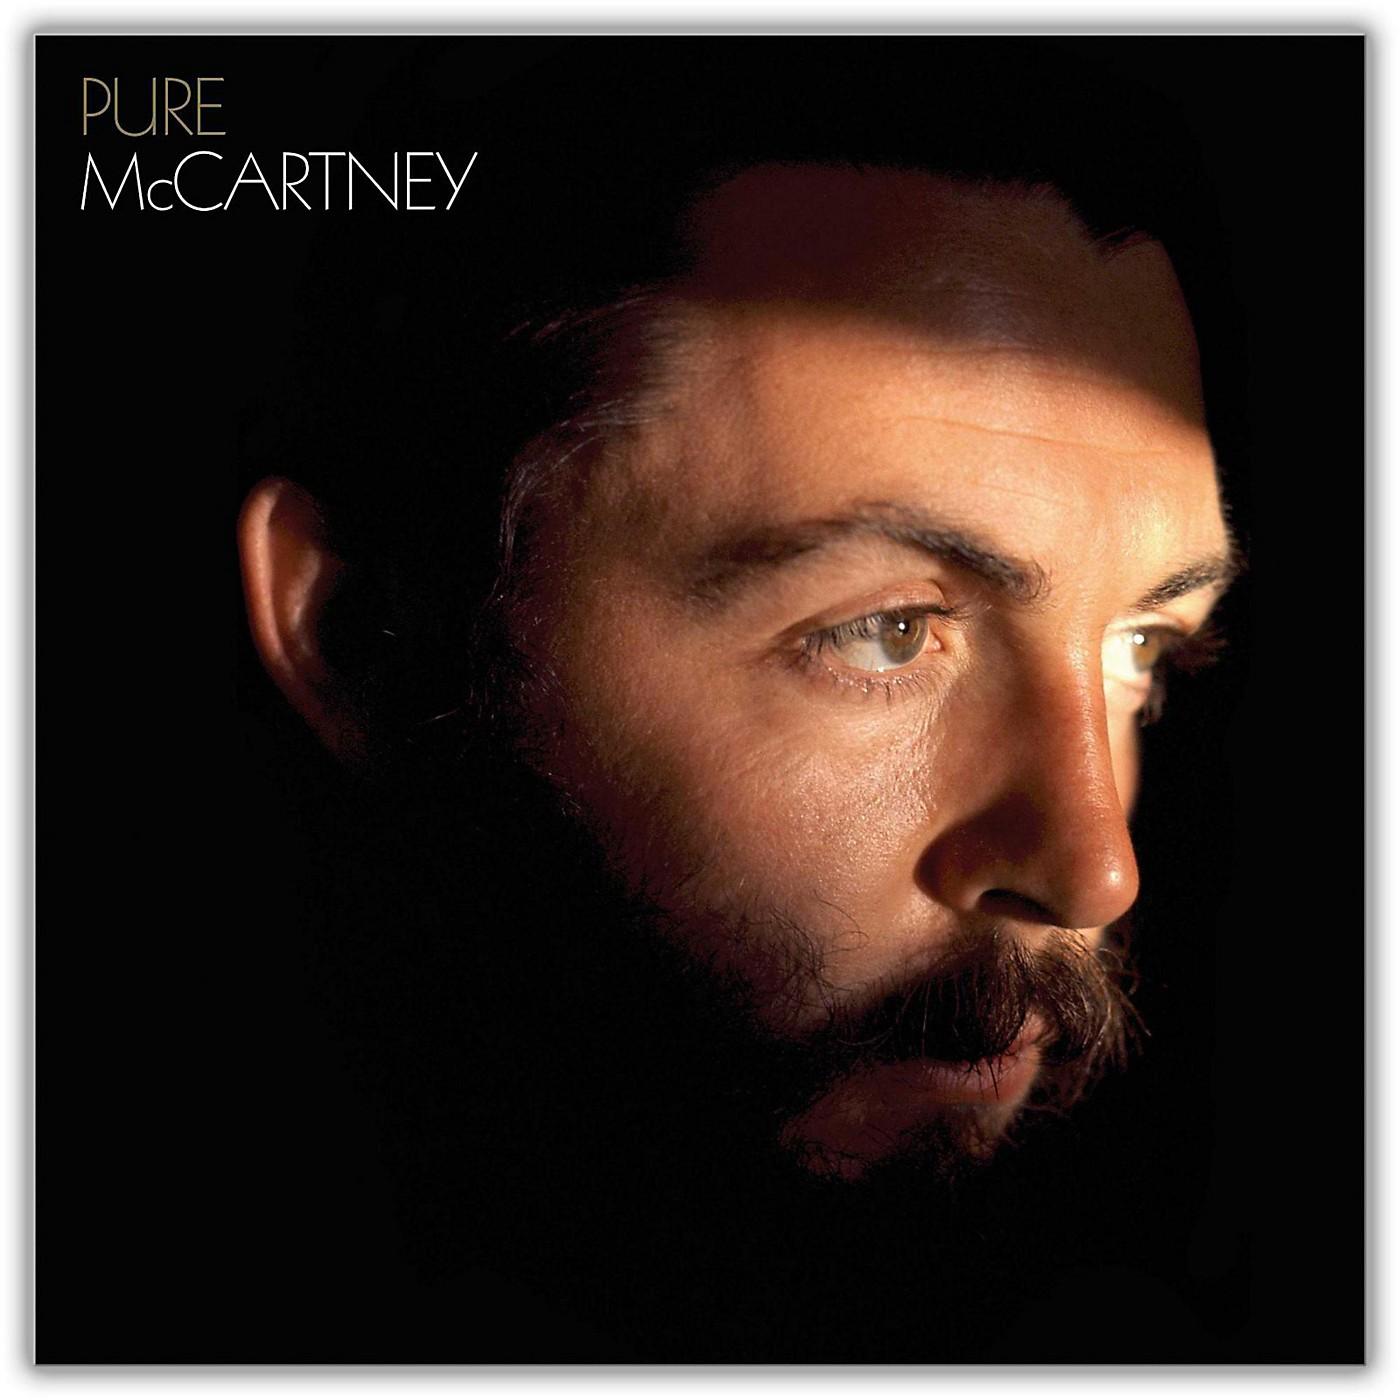 Universal Music Group Paul McCartney - Pure McCartney [4LP Box Set] thumbnail